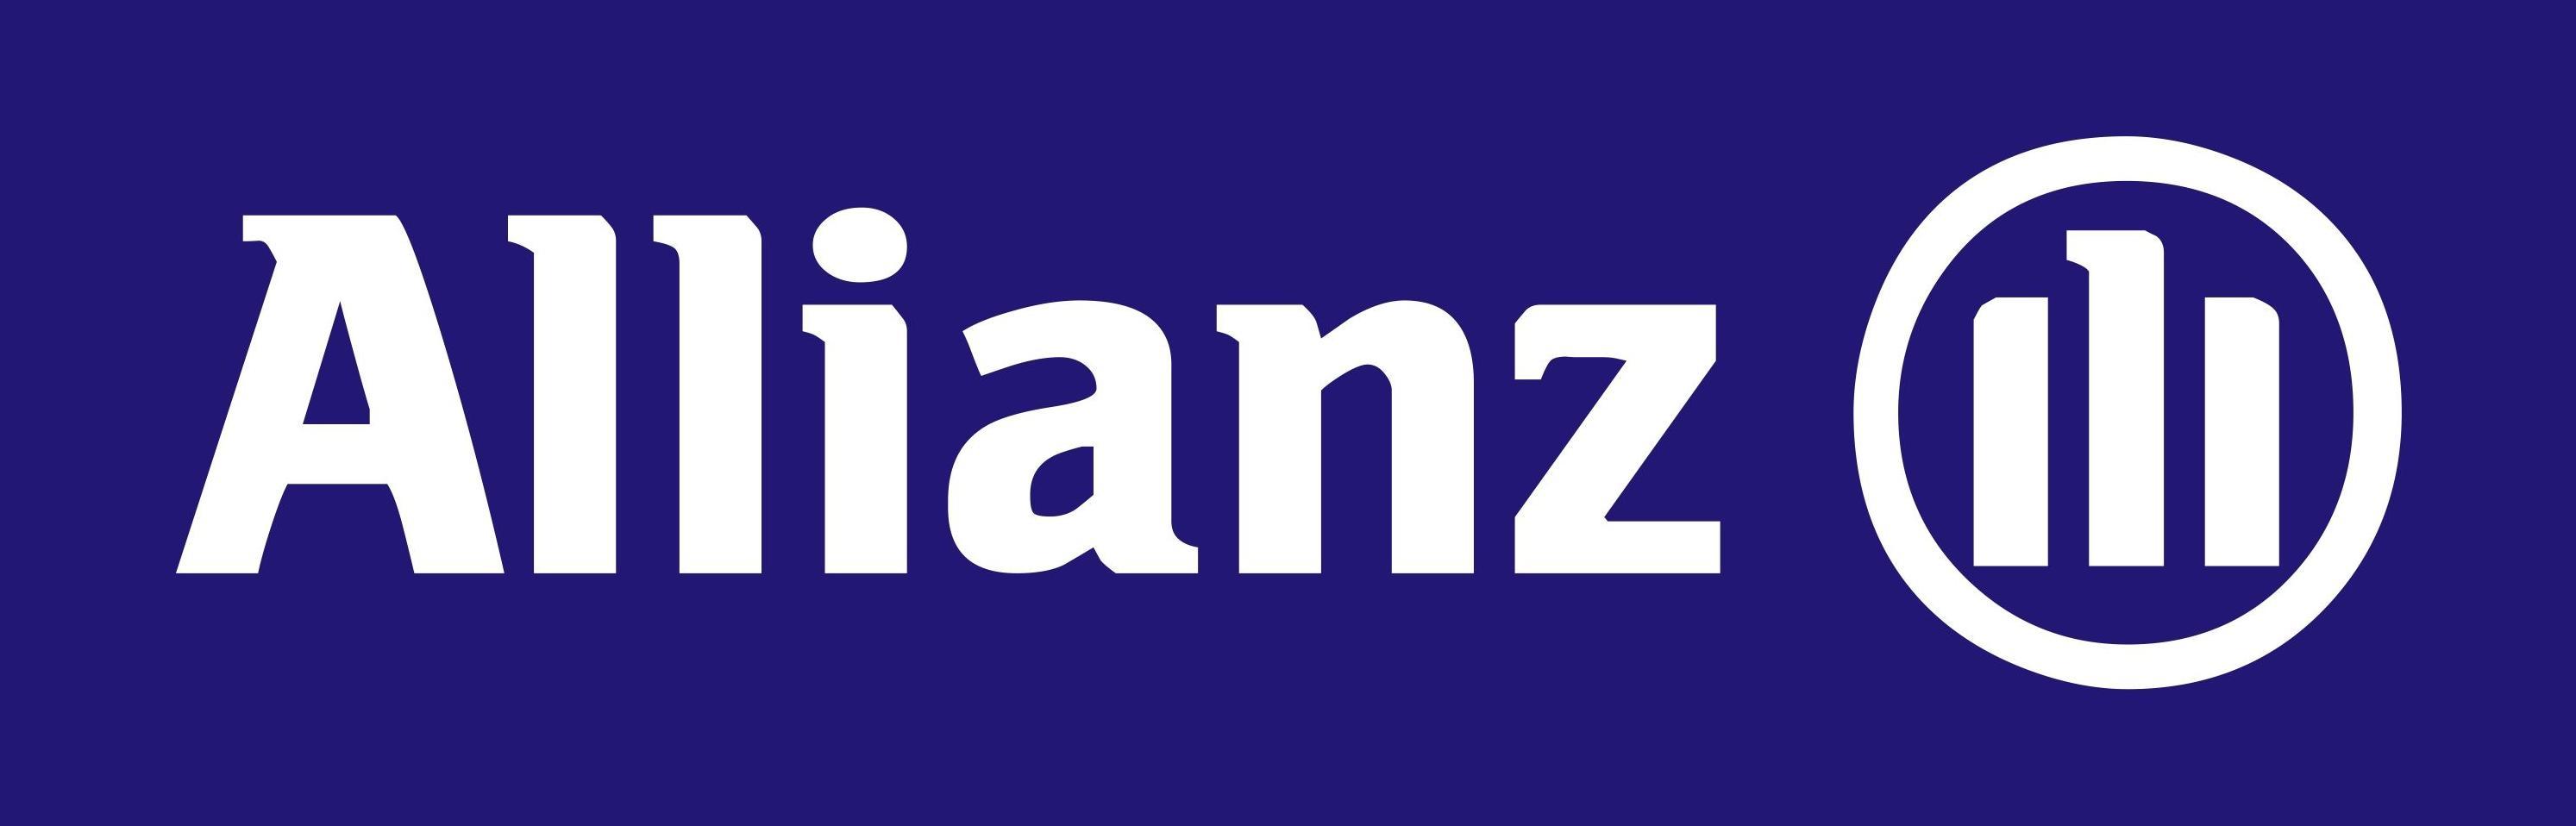 Allianz - Talleres Ralman Santander